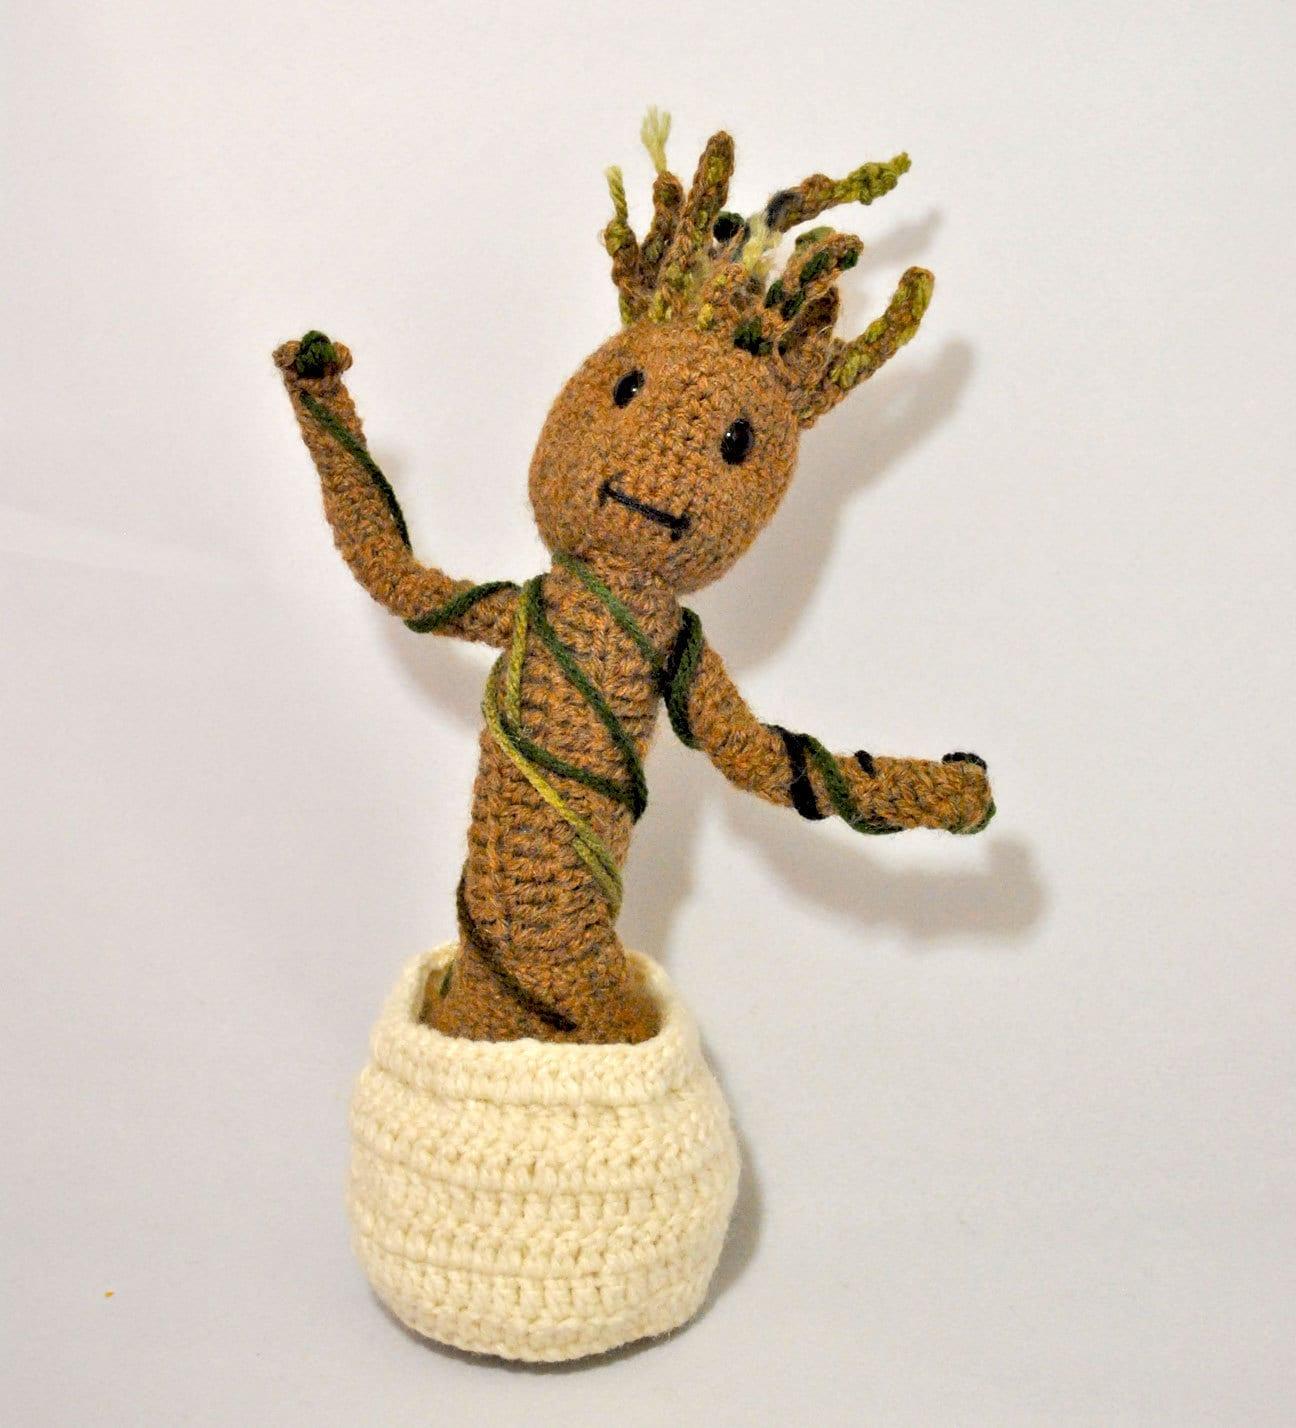 Amigurumi Patterns Groot : Crochet Pattern - Baby Groot - Amigurumi - Guadians of the ...